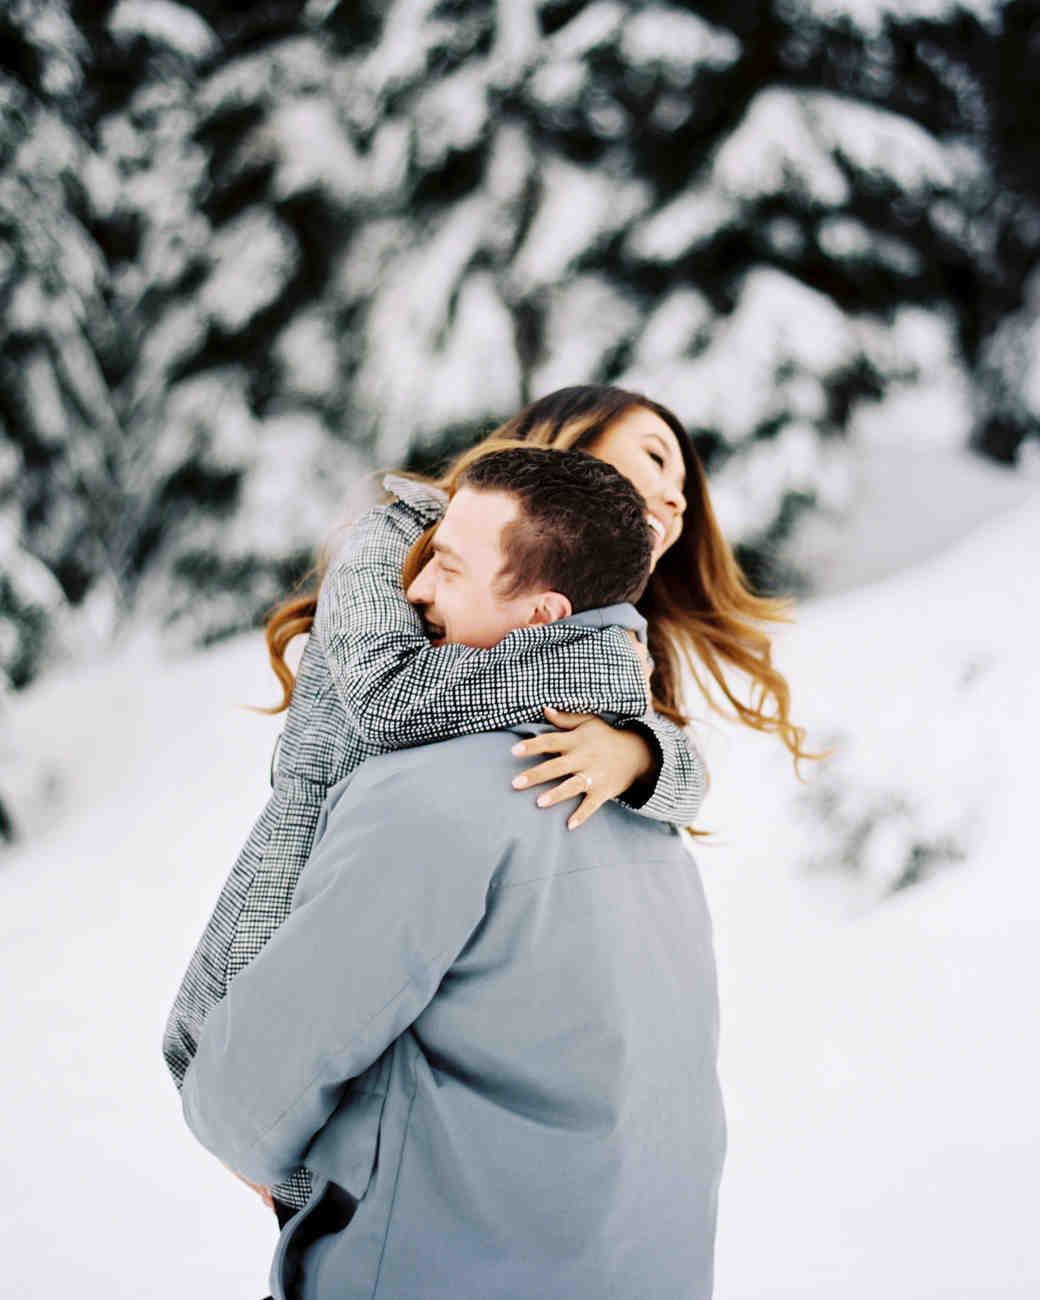 4f6cadaee2045 25 Snowy Engagement Photos to Inspire Your Own | Martha Stewart Weddings